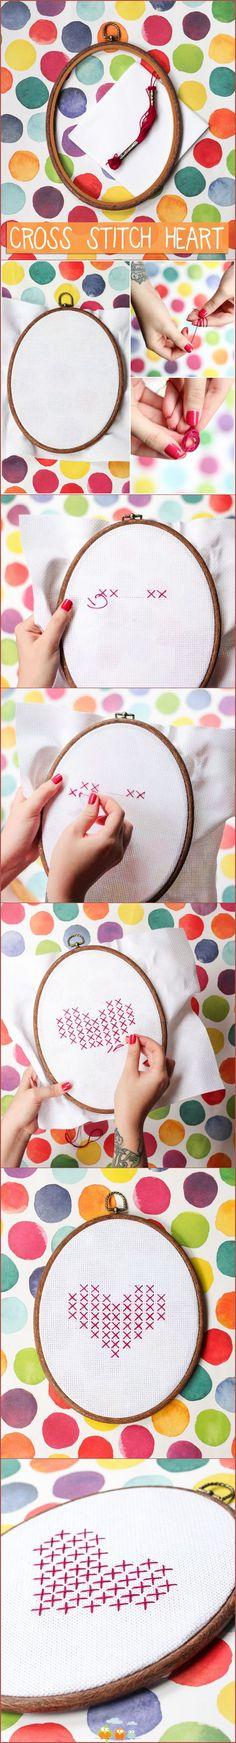 Cross stitch heart tutorial